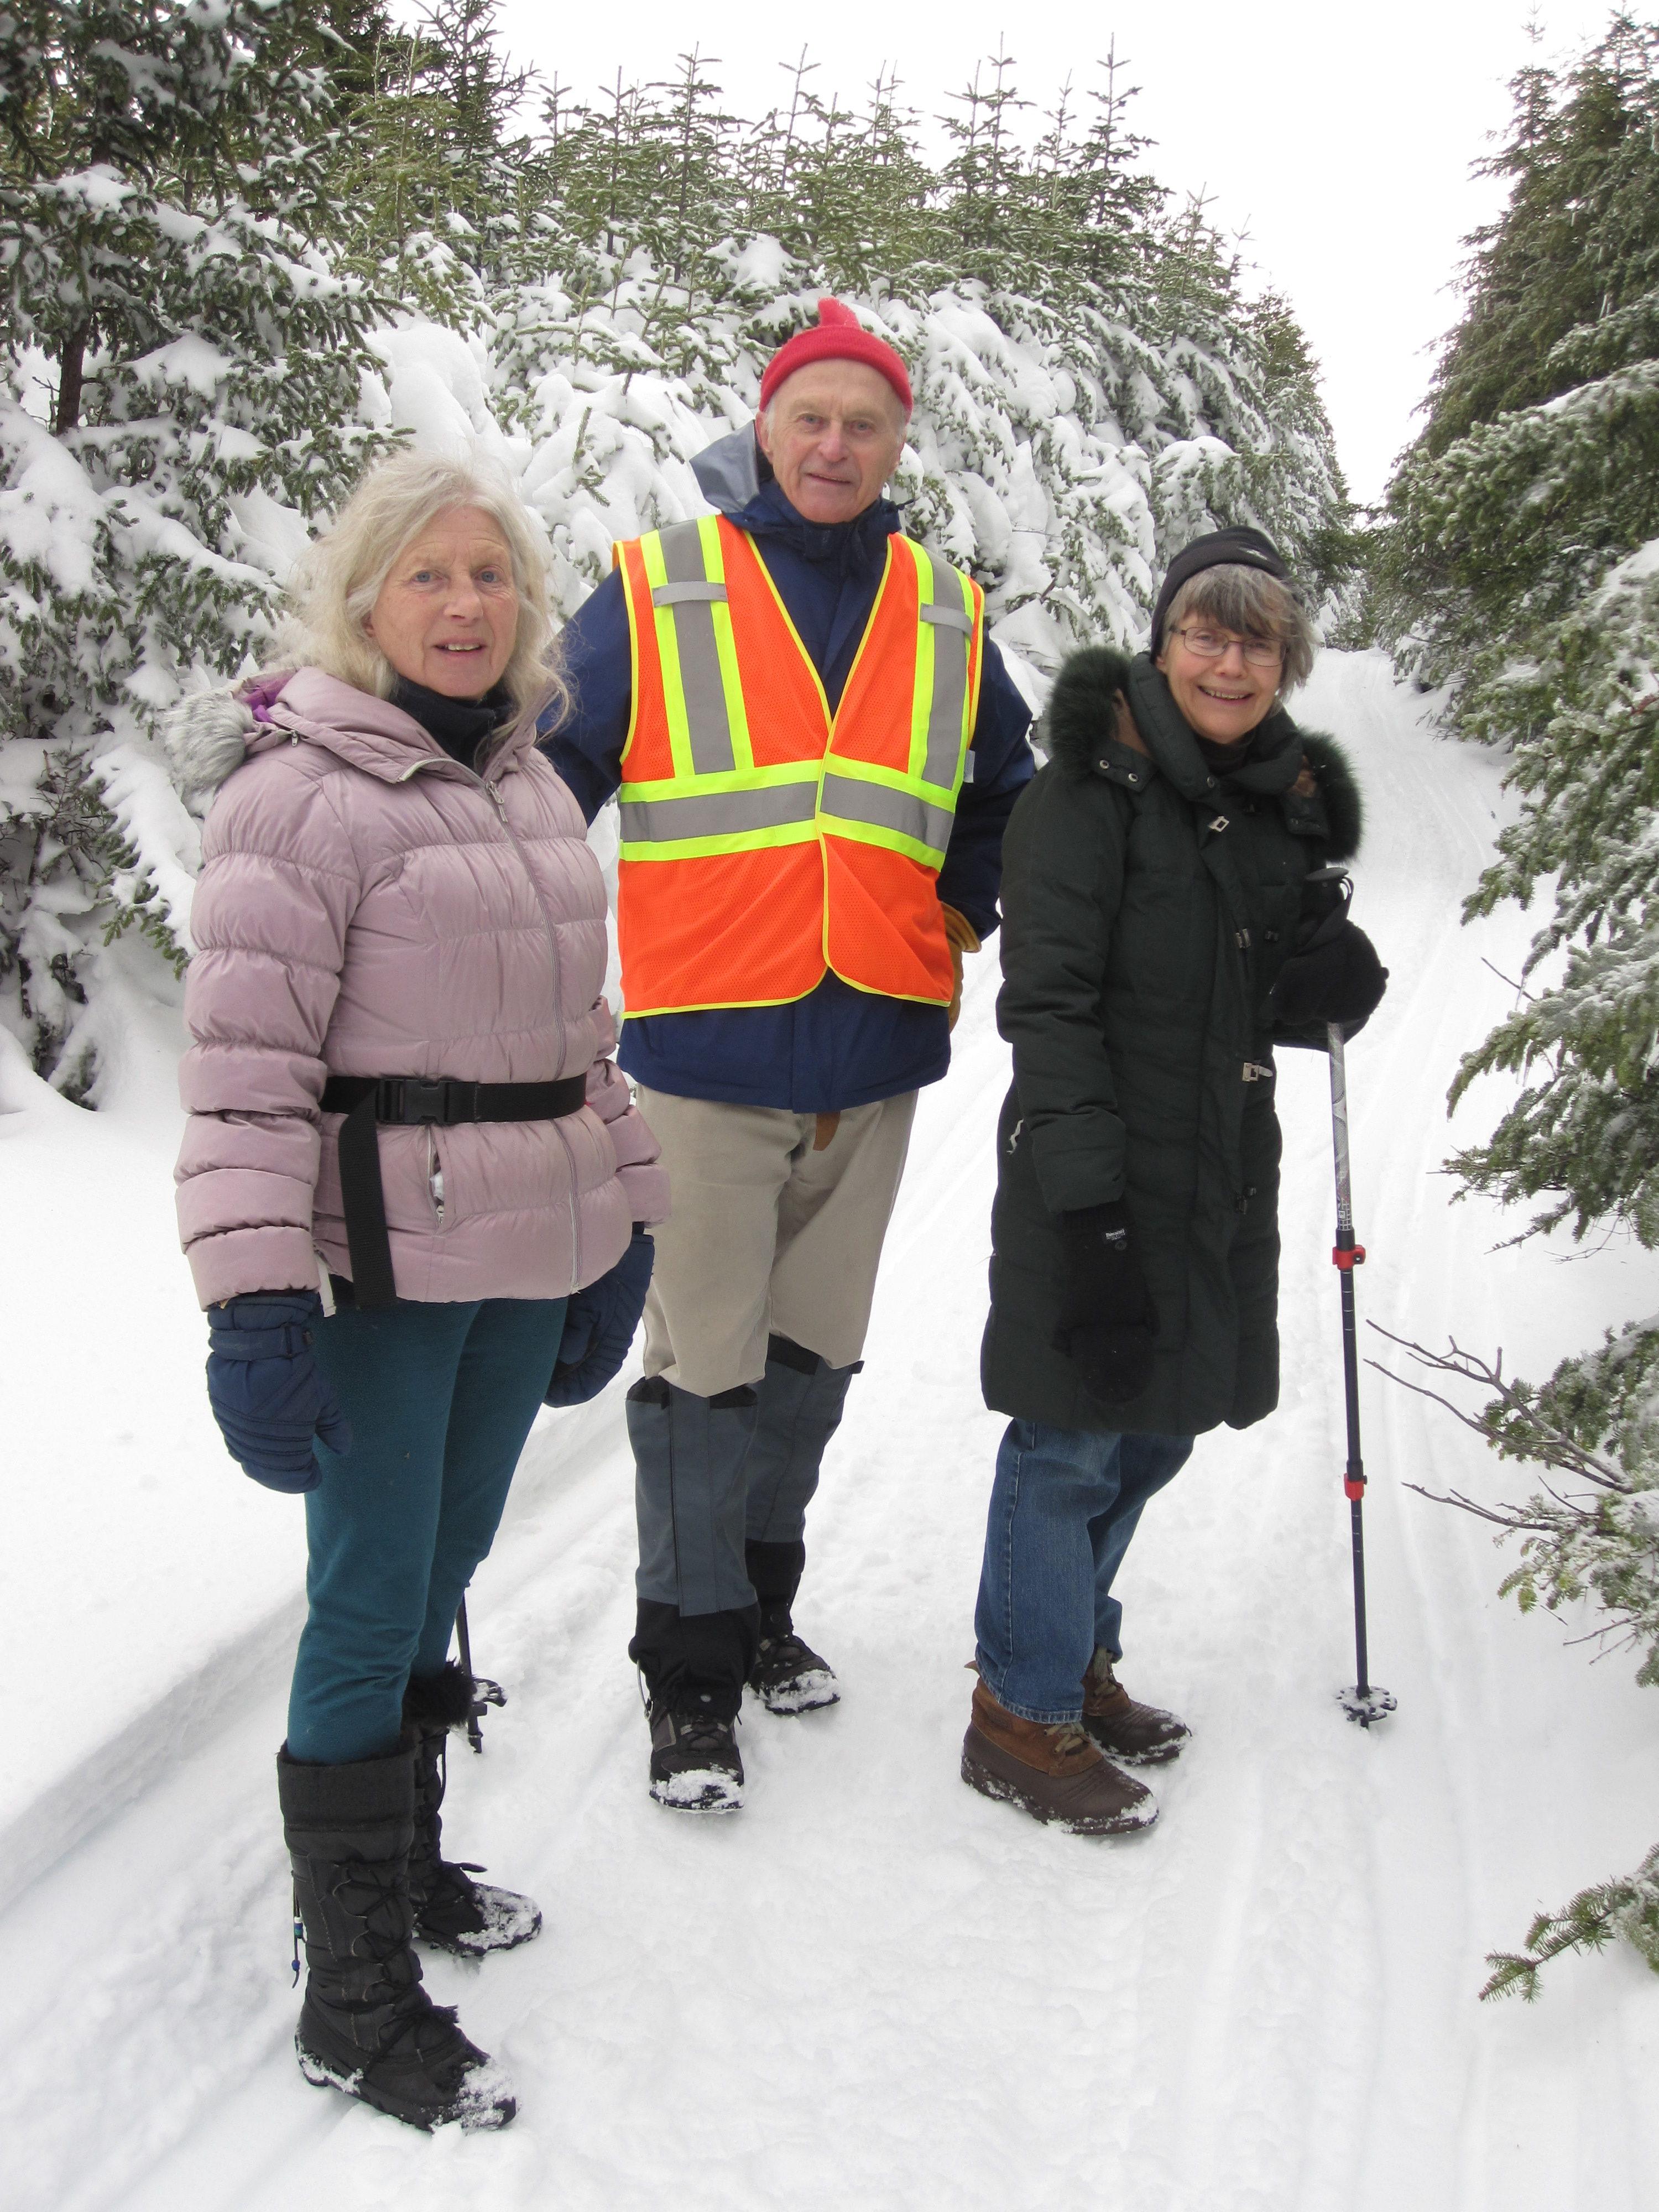 Trip report – snowshoeing in a winter wonderland